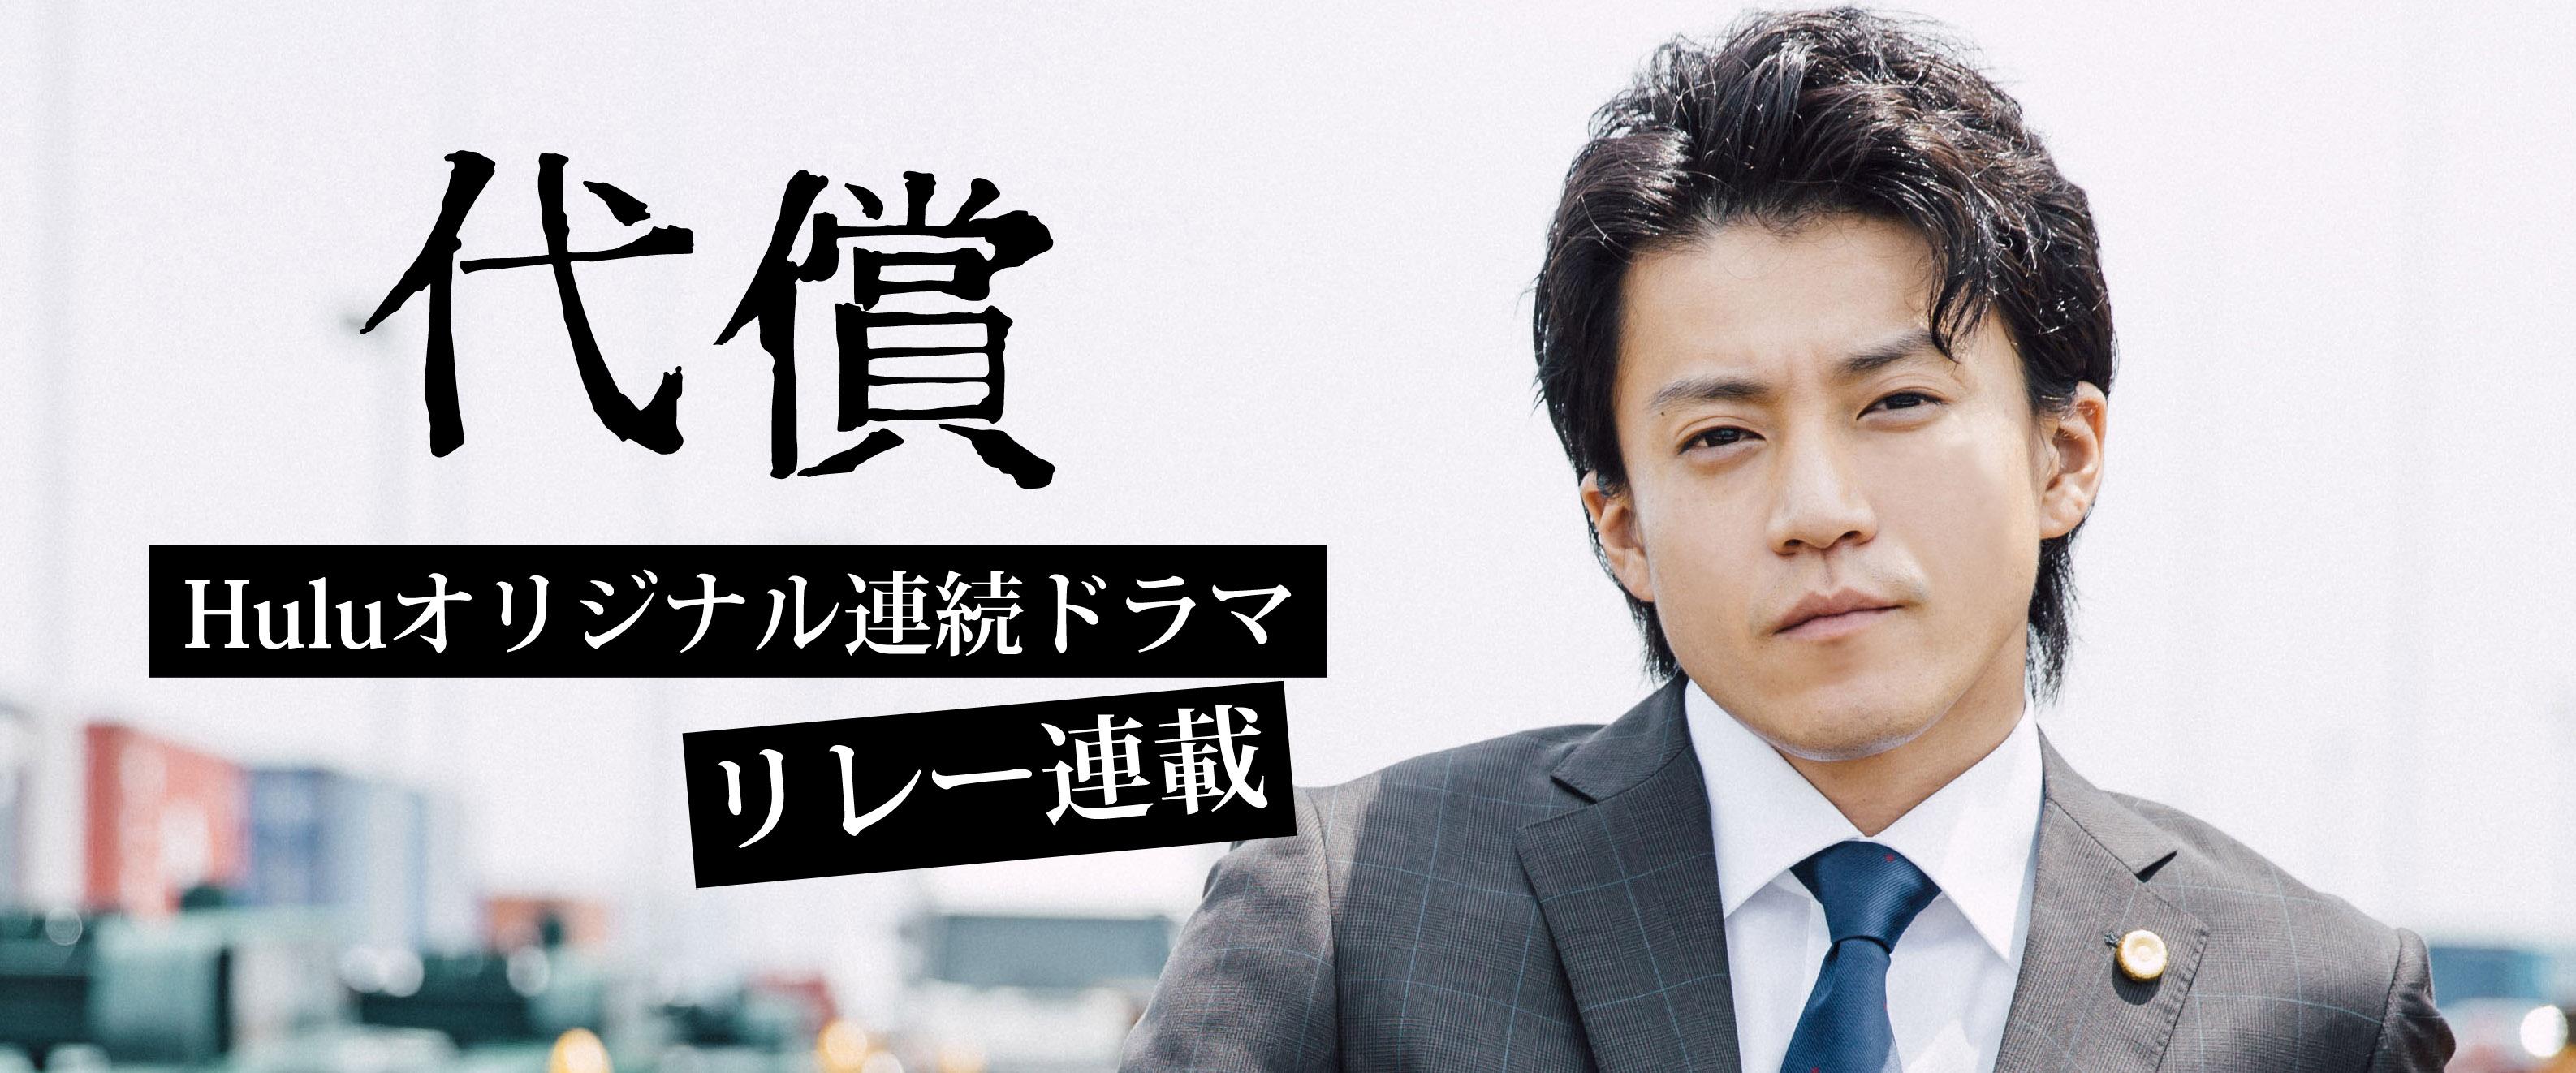 Huluオリジナル連続ドラマ「代償」リレー連載